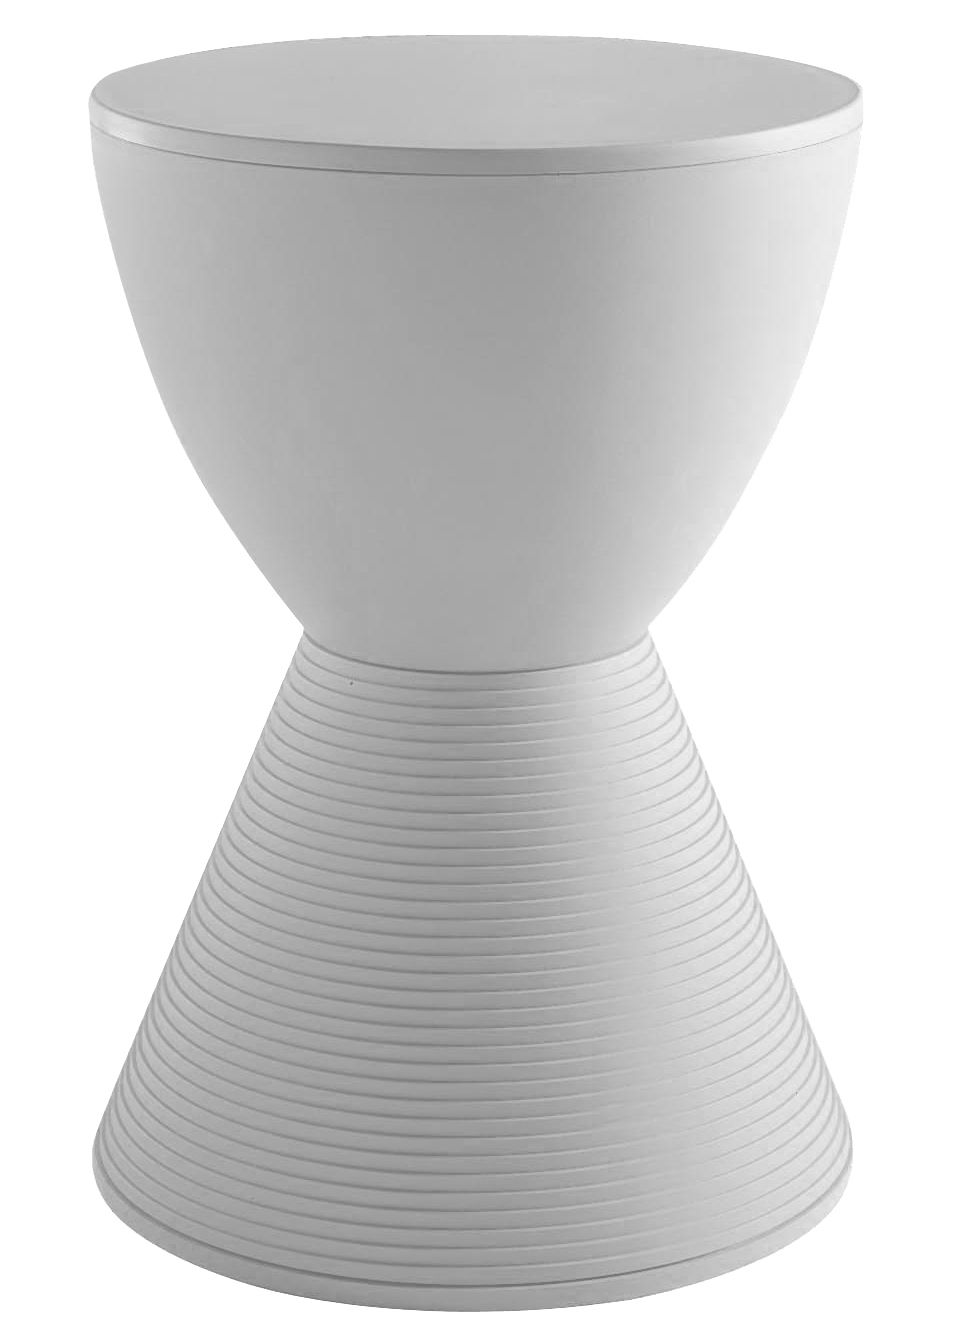 Mobilier - Tabourets bas - Tabouret Prince AHA / Plastique - Kartell - Blanc cire - Polypropylène